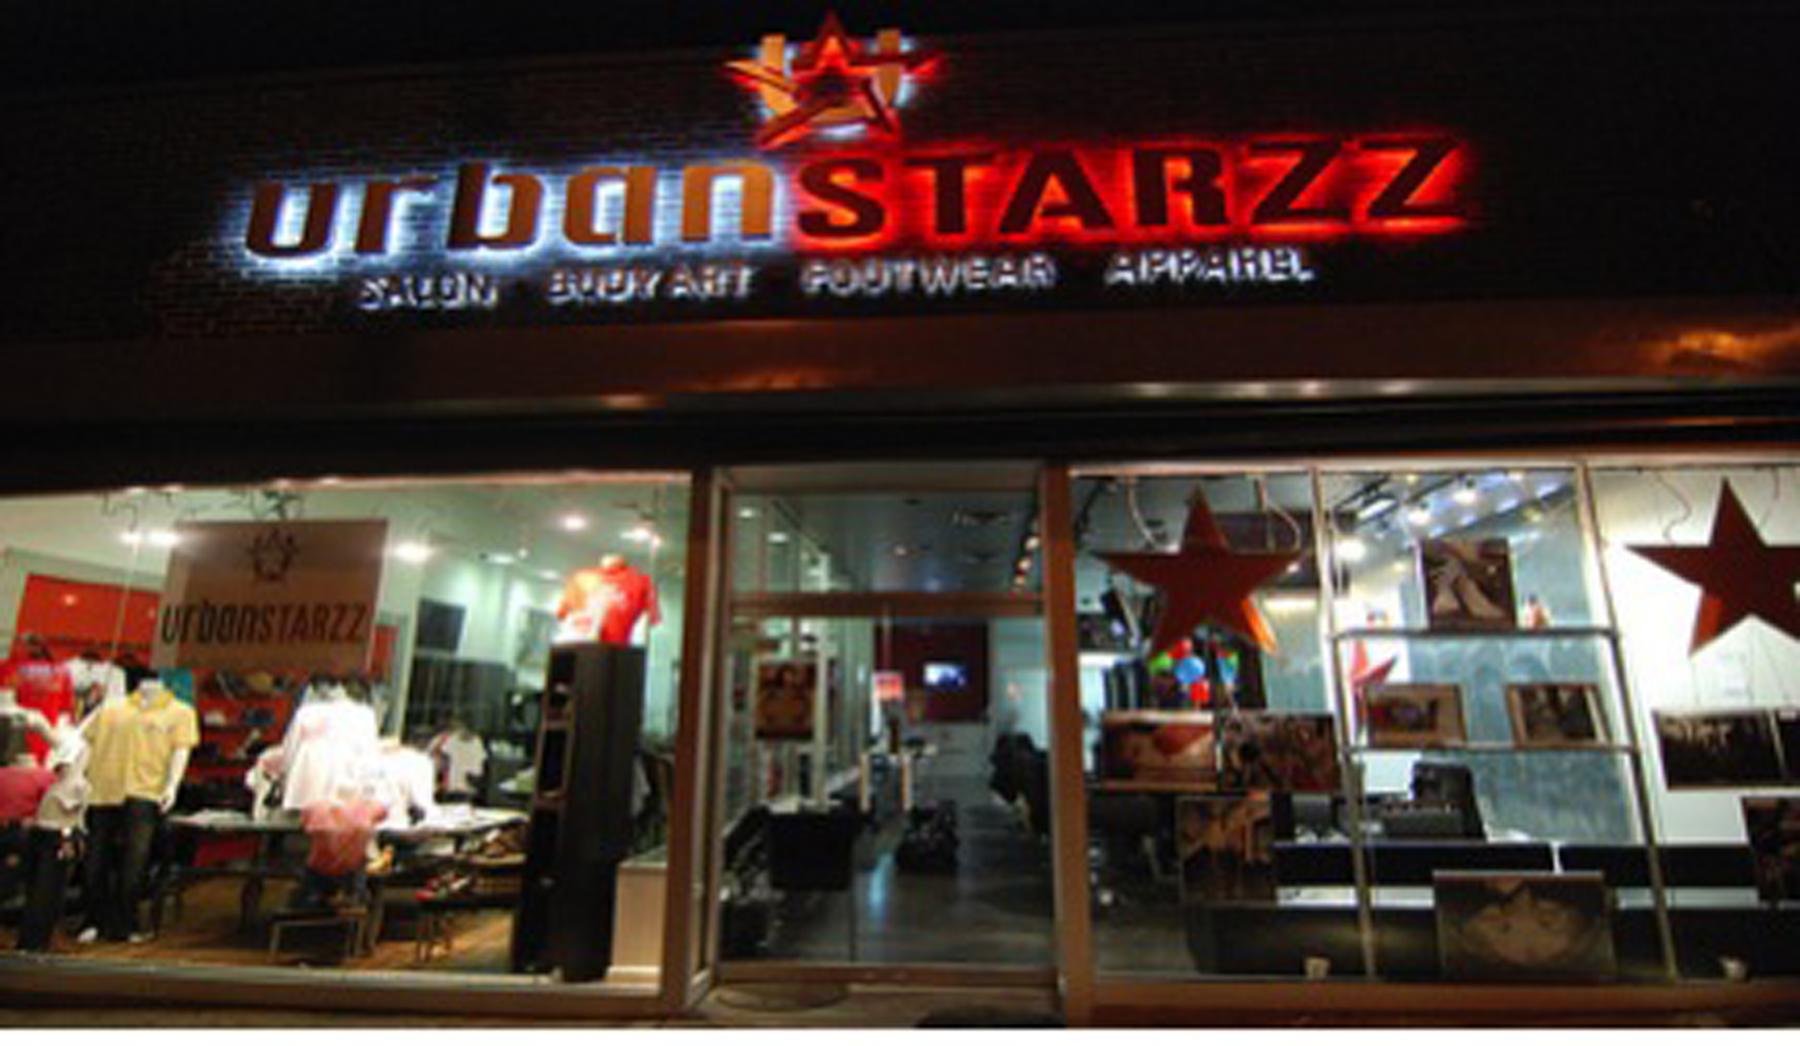 Urban Starzz Storefront copy.jpg